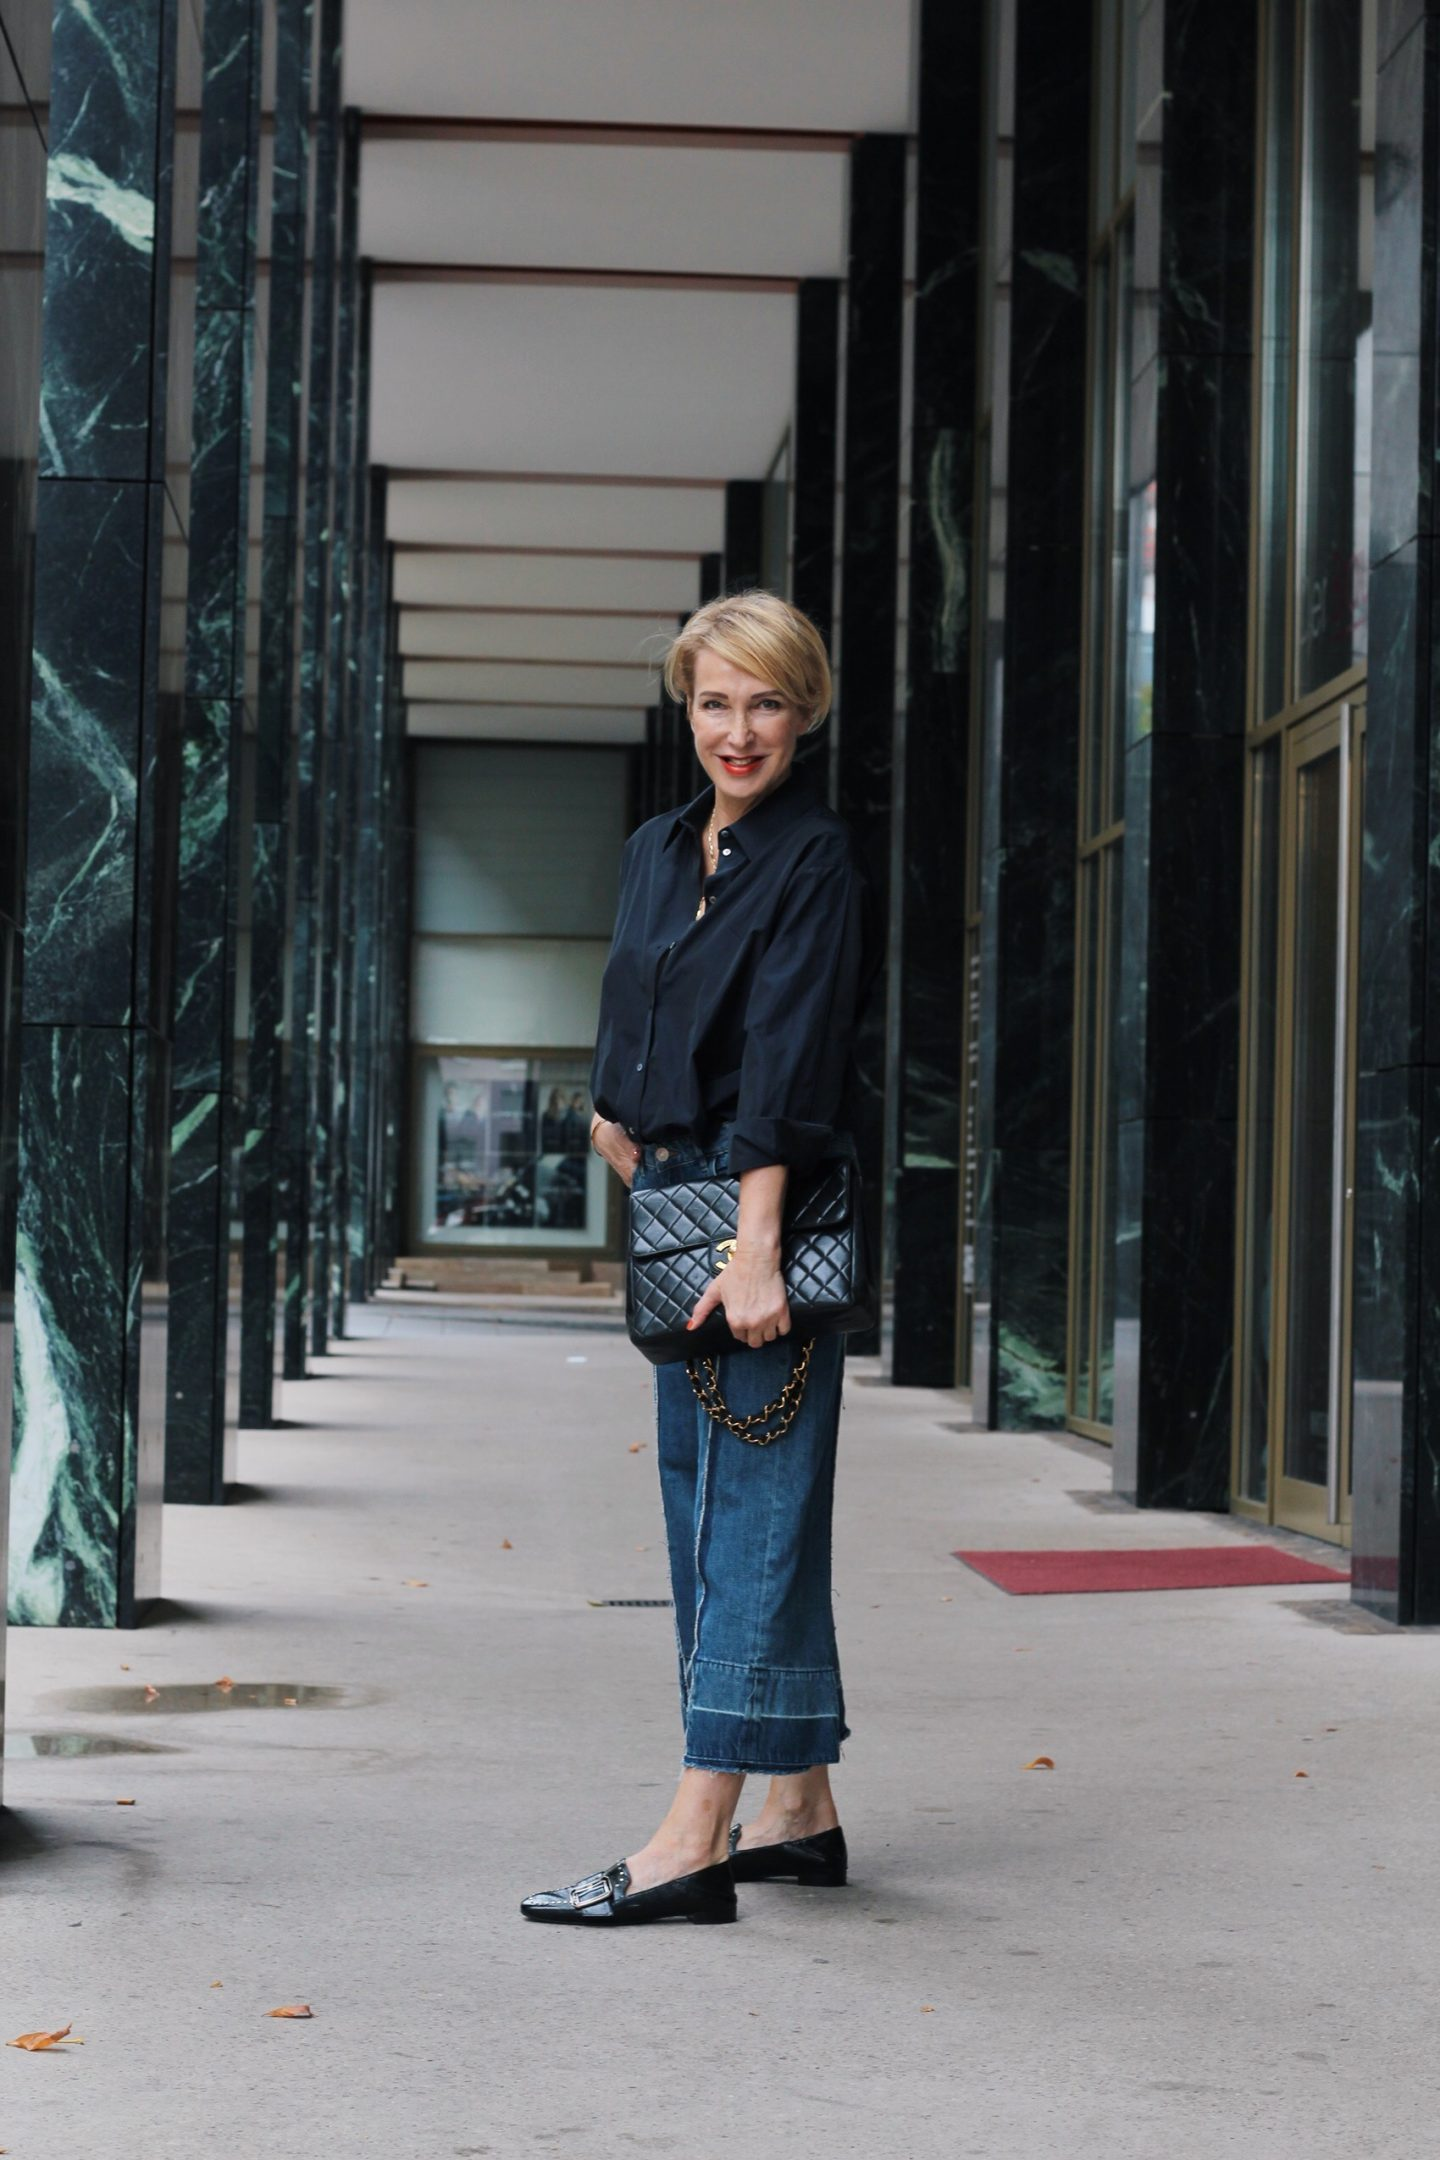 glamupyourlifestyle jeans-culotte hosenröcke culottes herbst-trends ü-40-blog ue-50-blog ue-40-mode